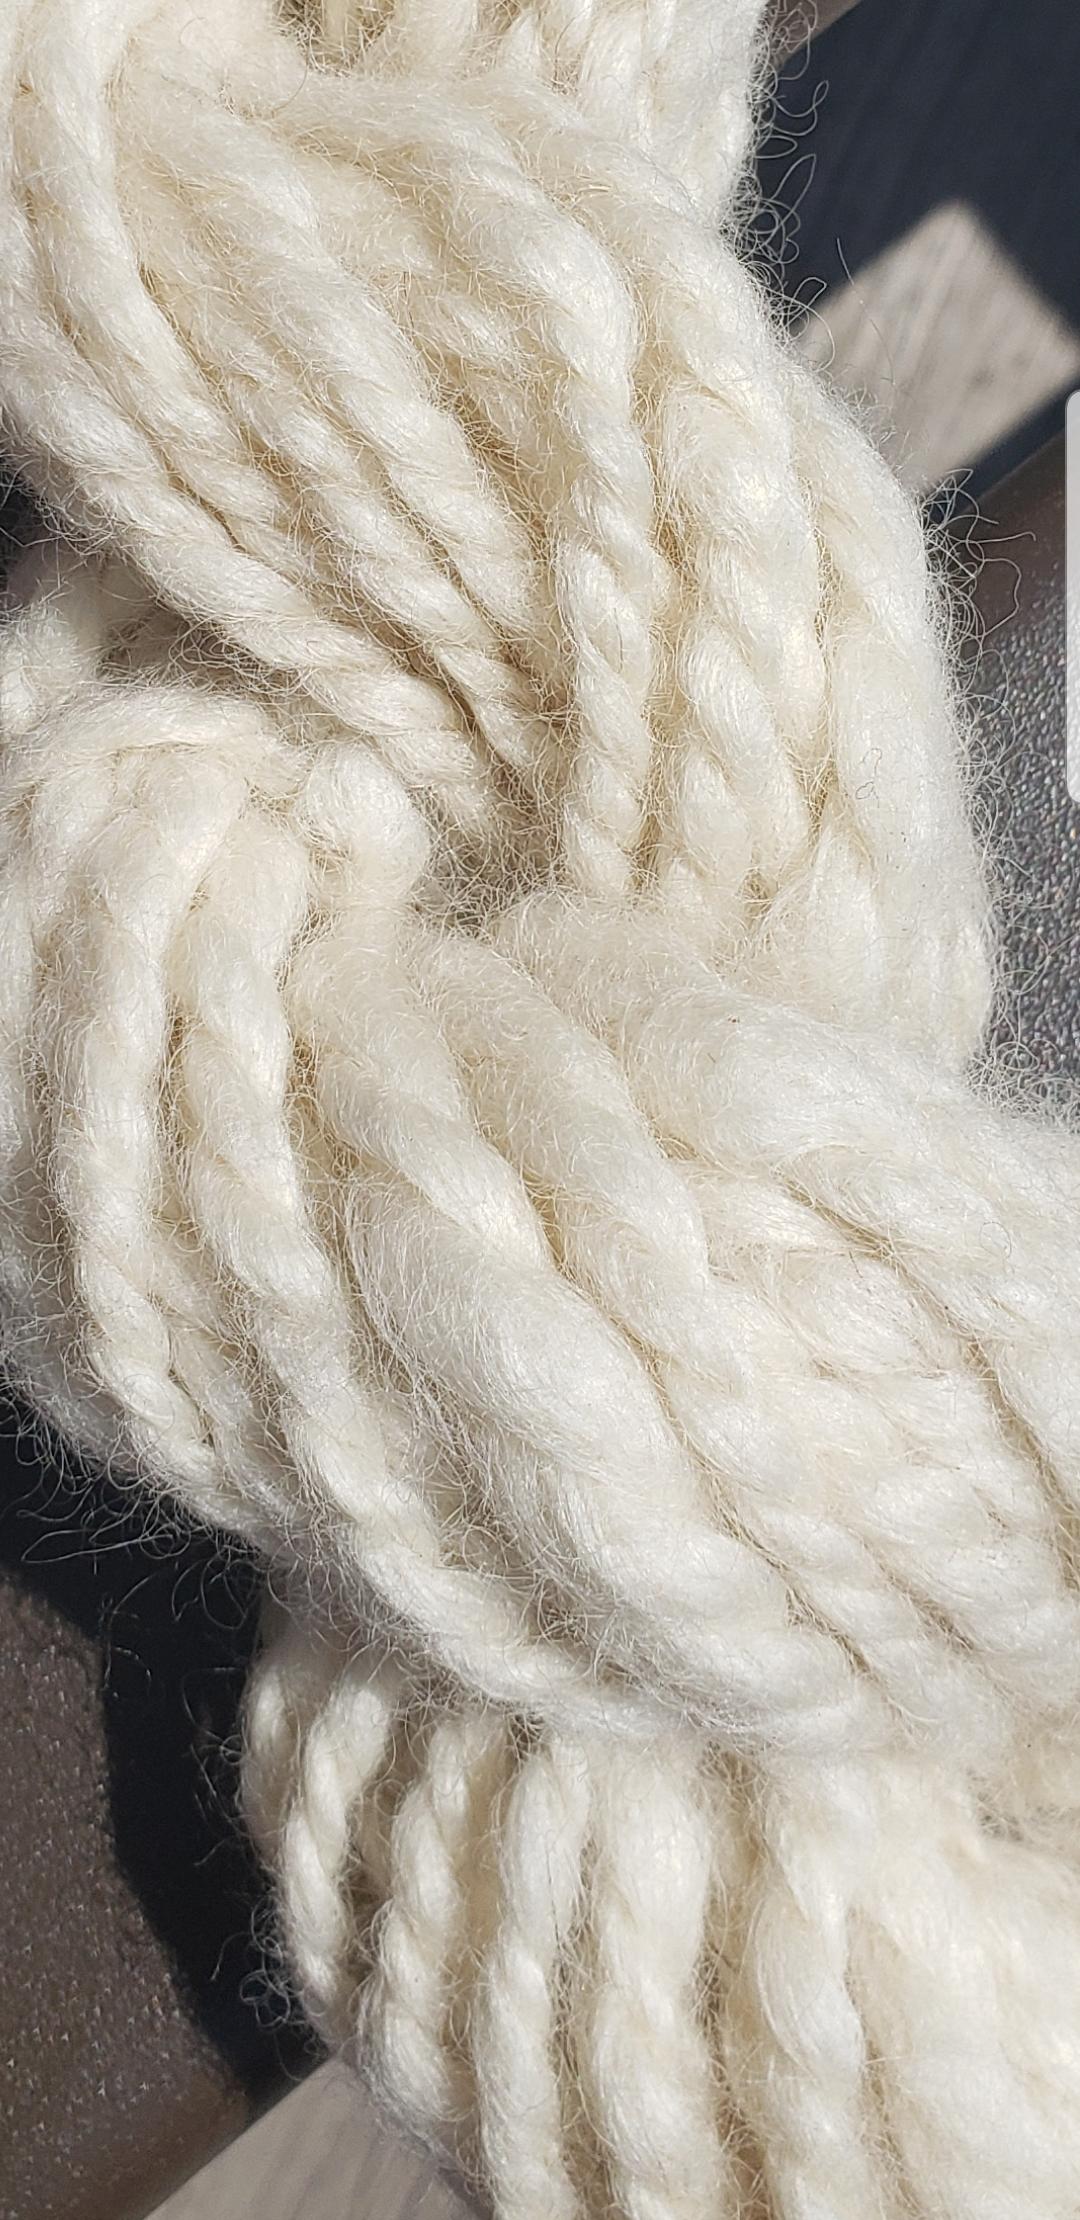 Leicester Longwool yarn in full sun to display lustre